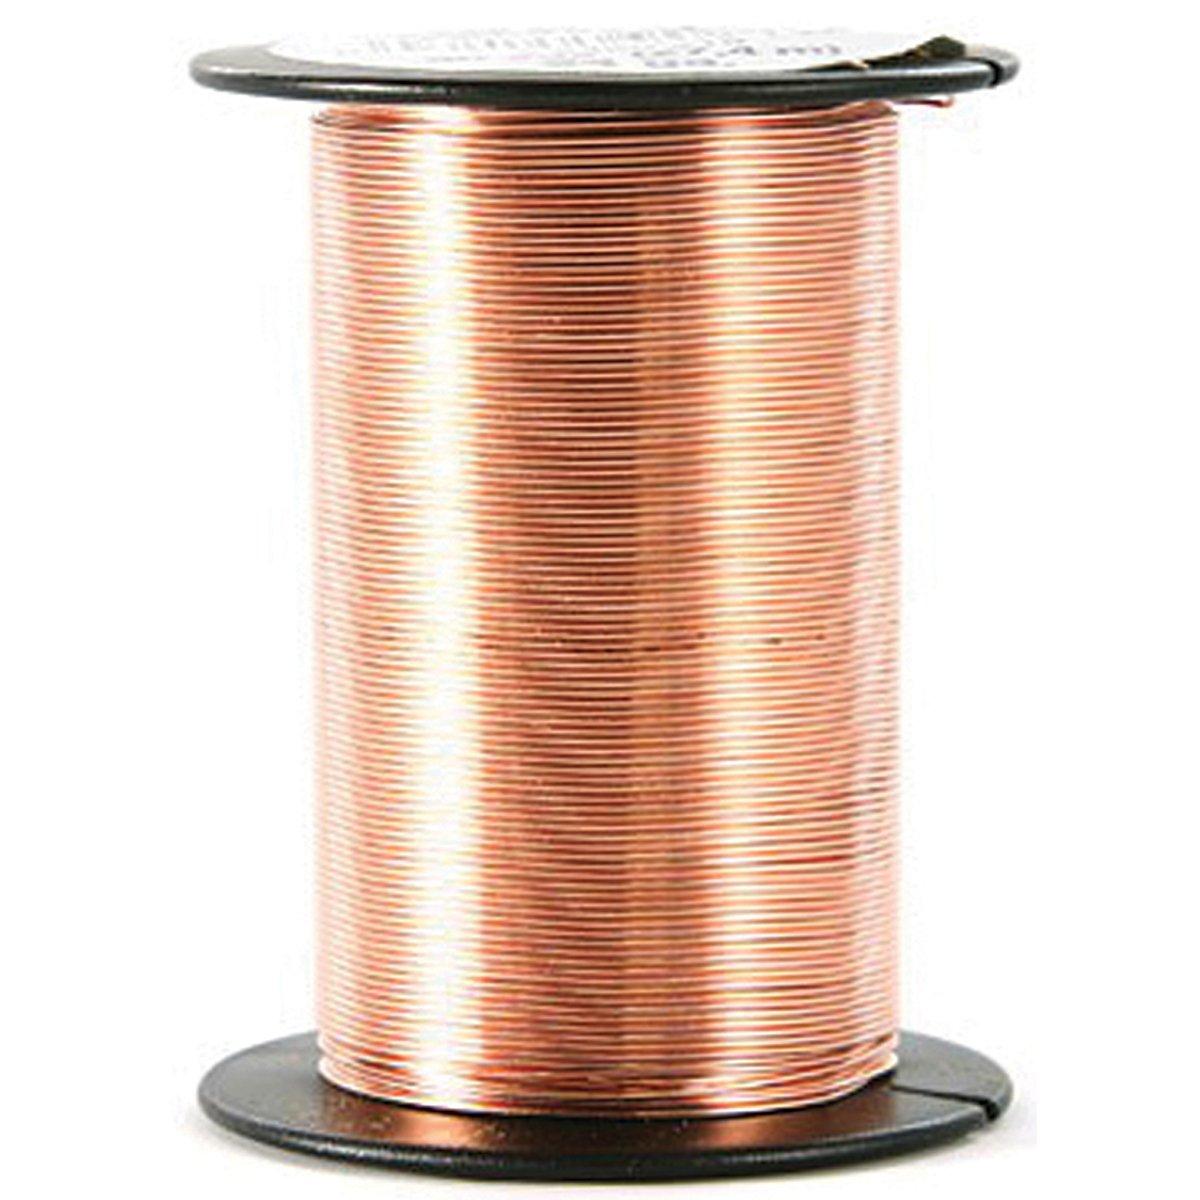 Beadery 24 Gauge Wire 25 Yards/Pkg-Copper 2490219